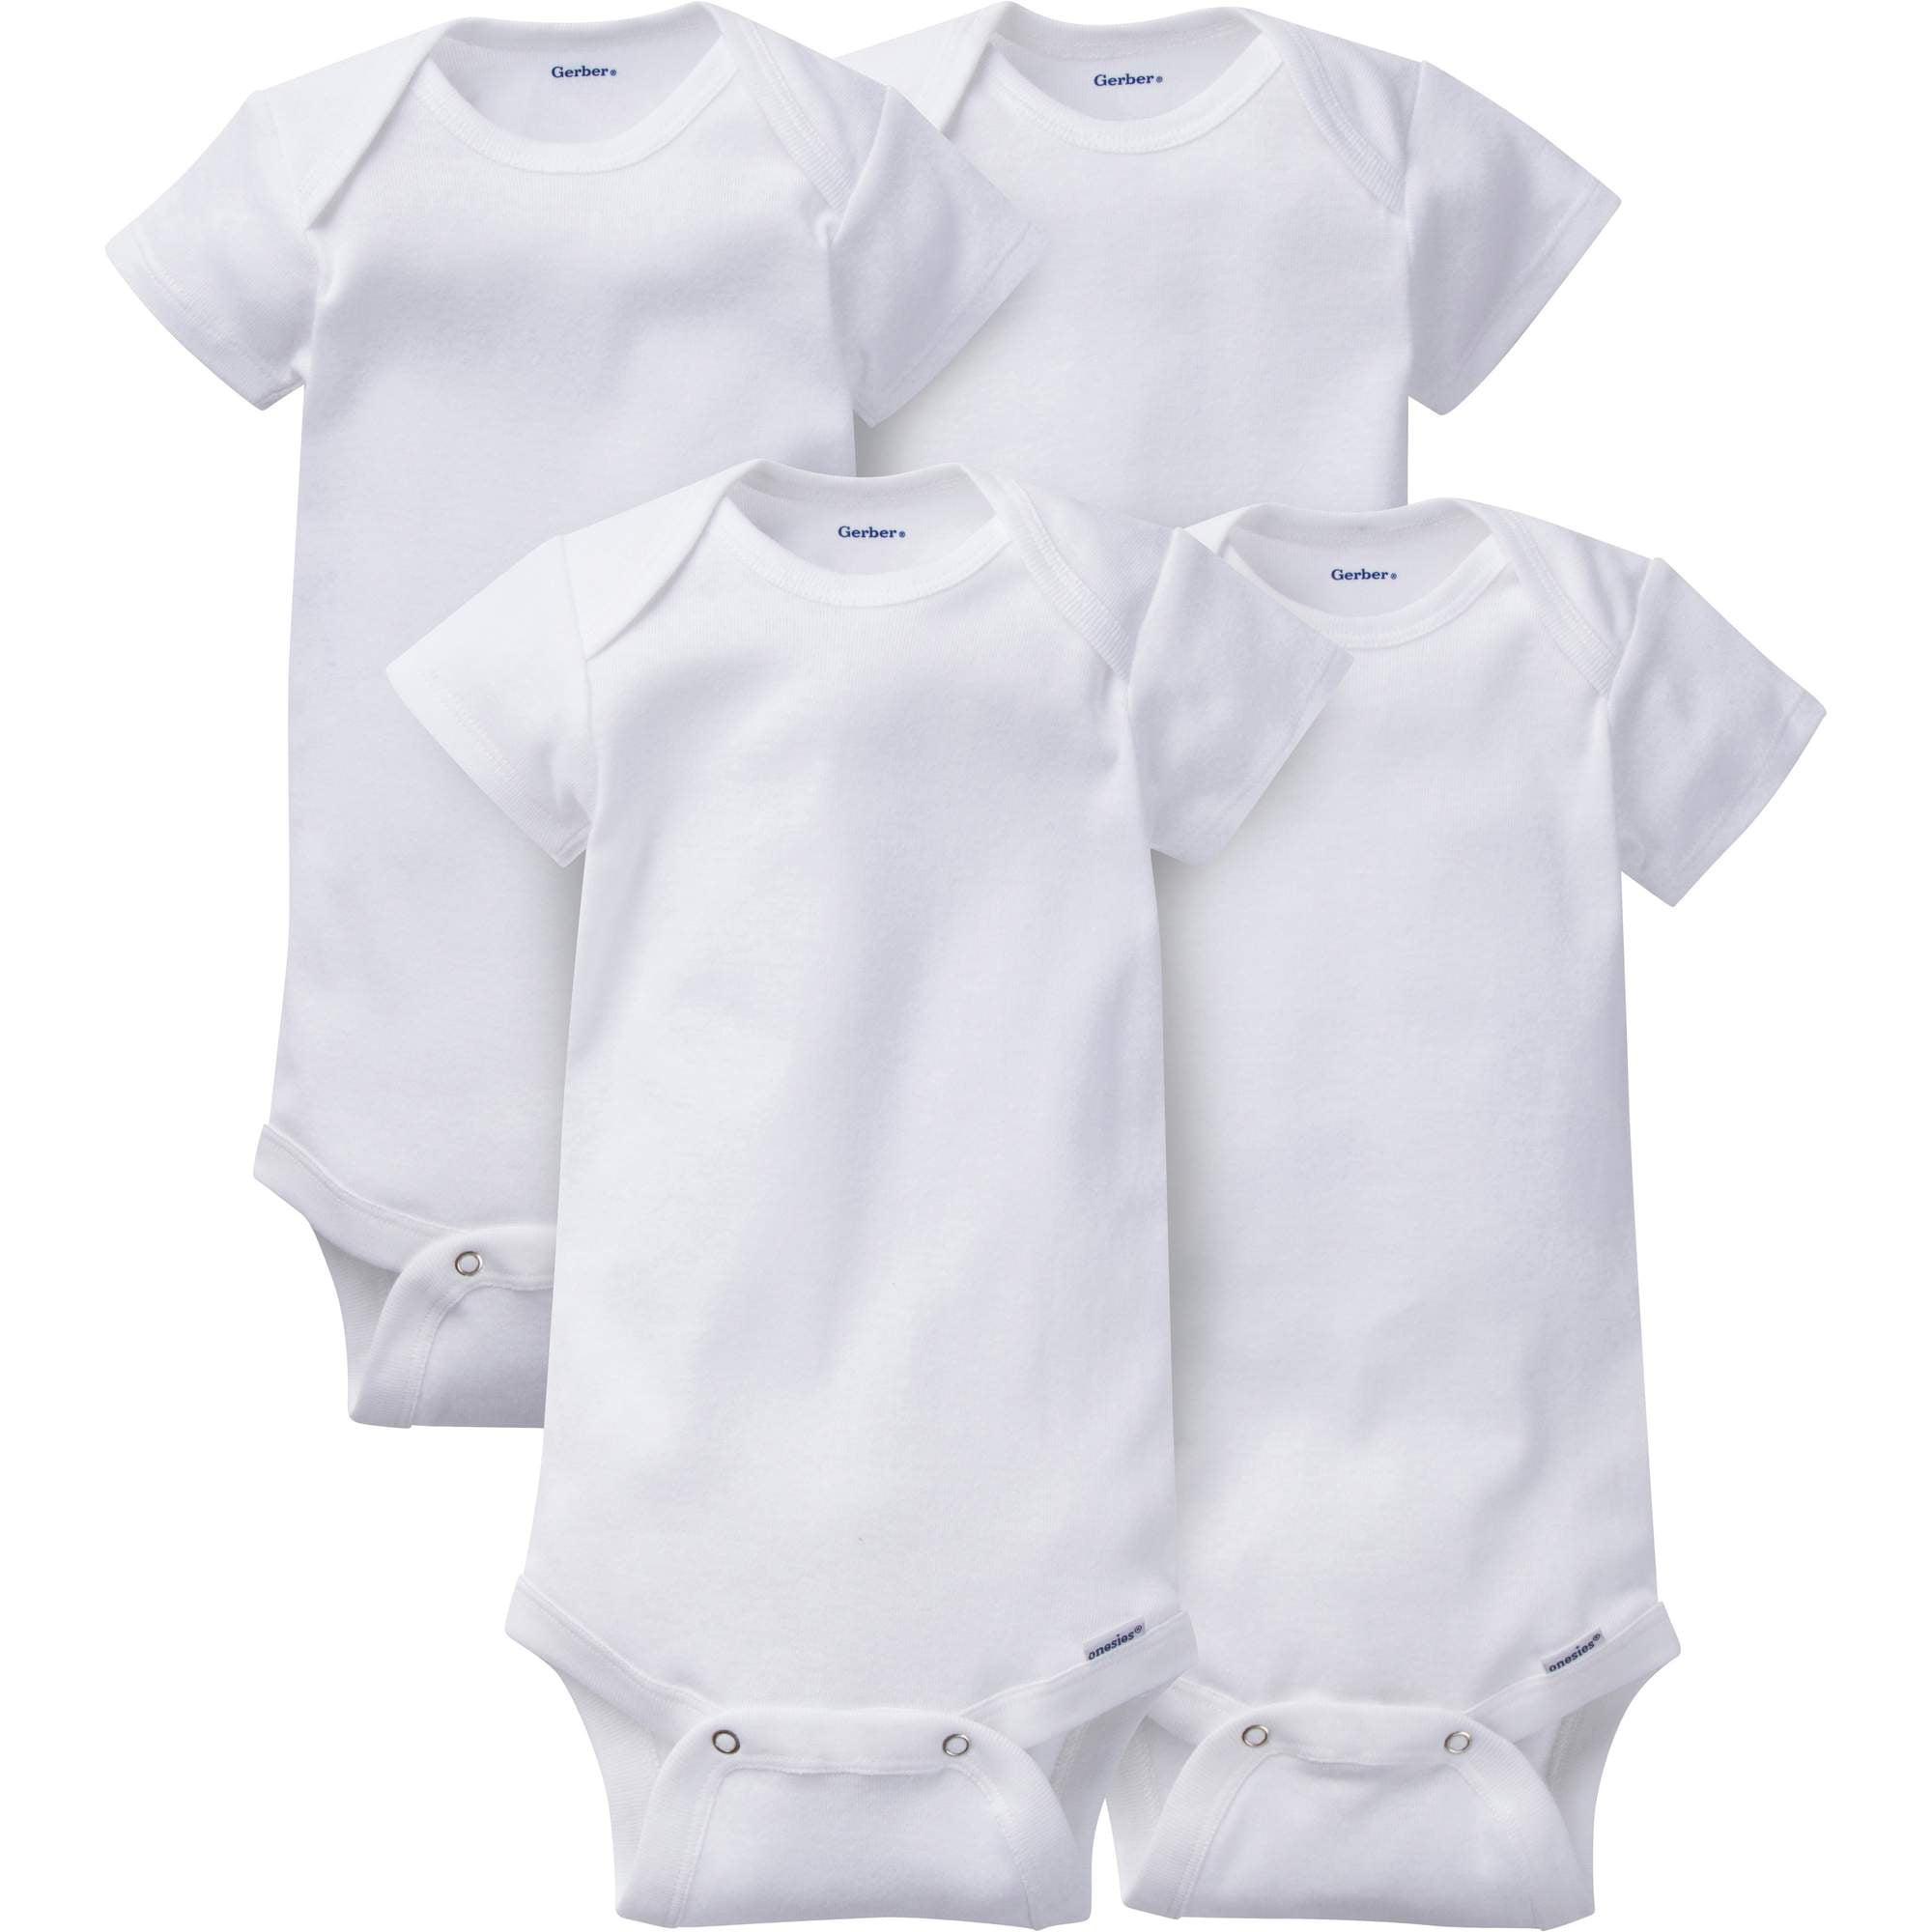 01f4d51d3 Gerber - Newborn Baby Onesies Brand Organic Short Sleeve Bodysuits ...